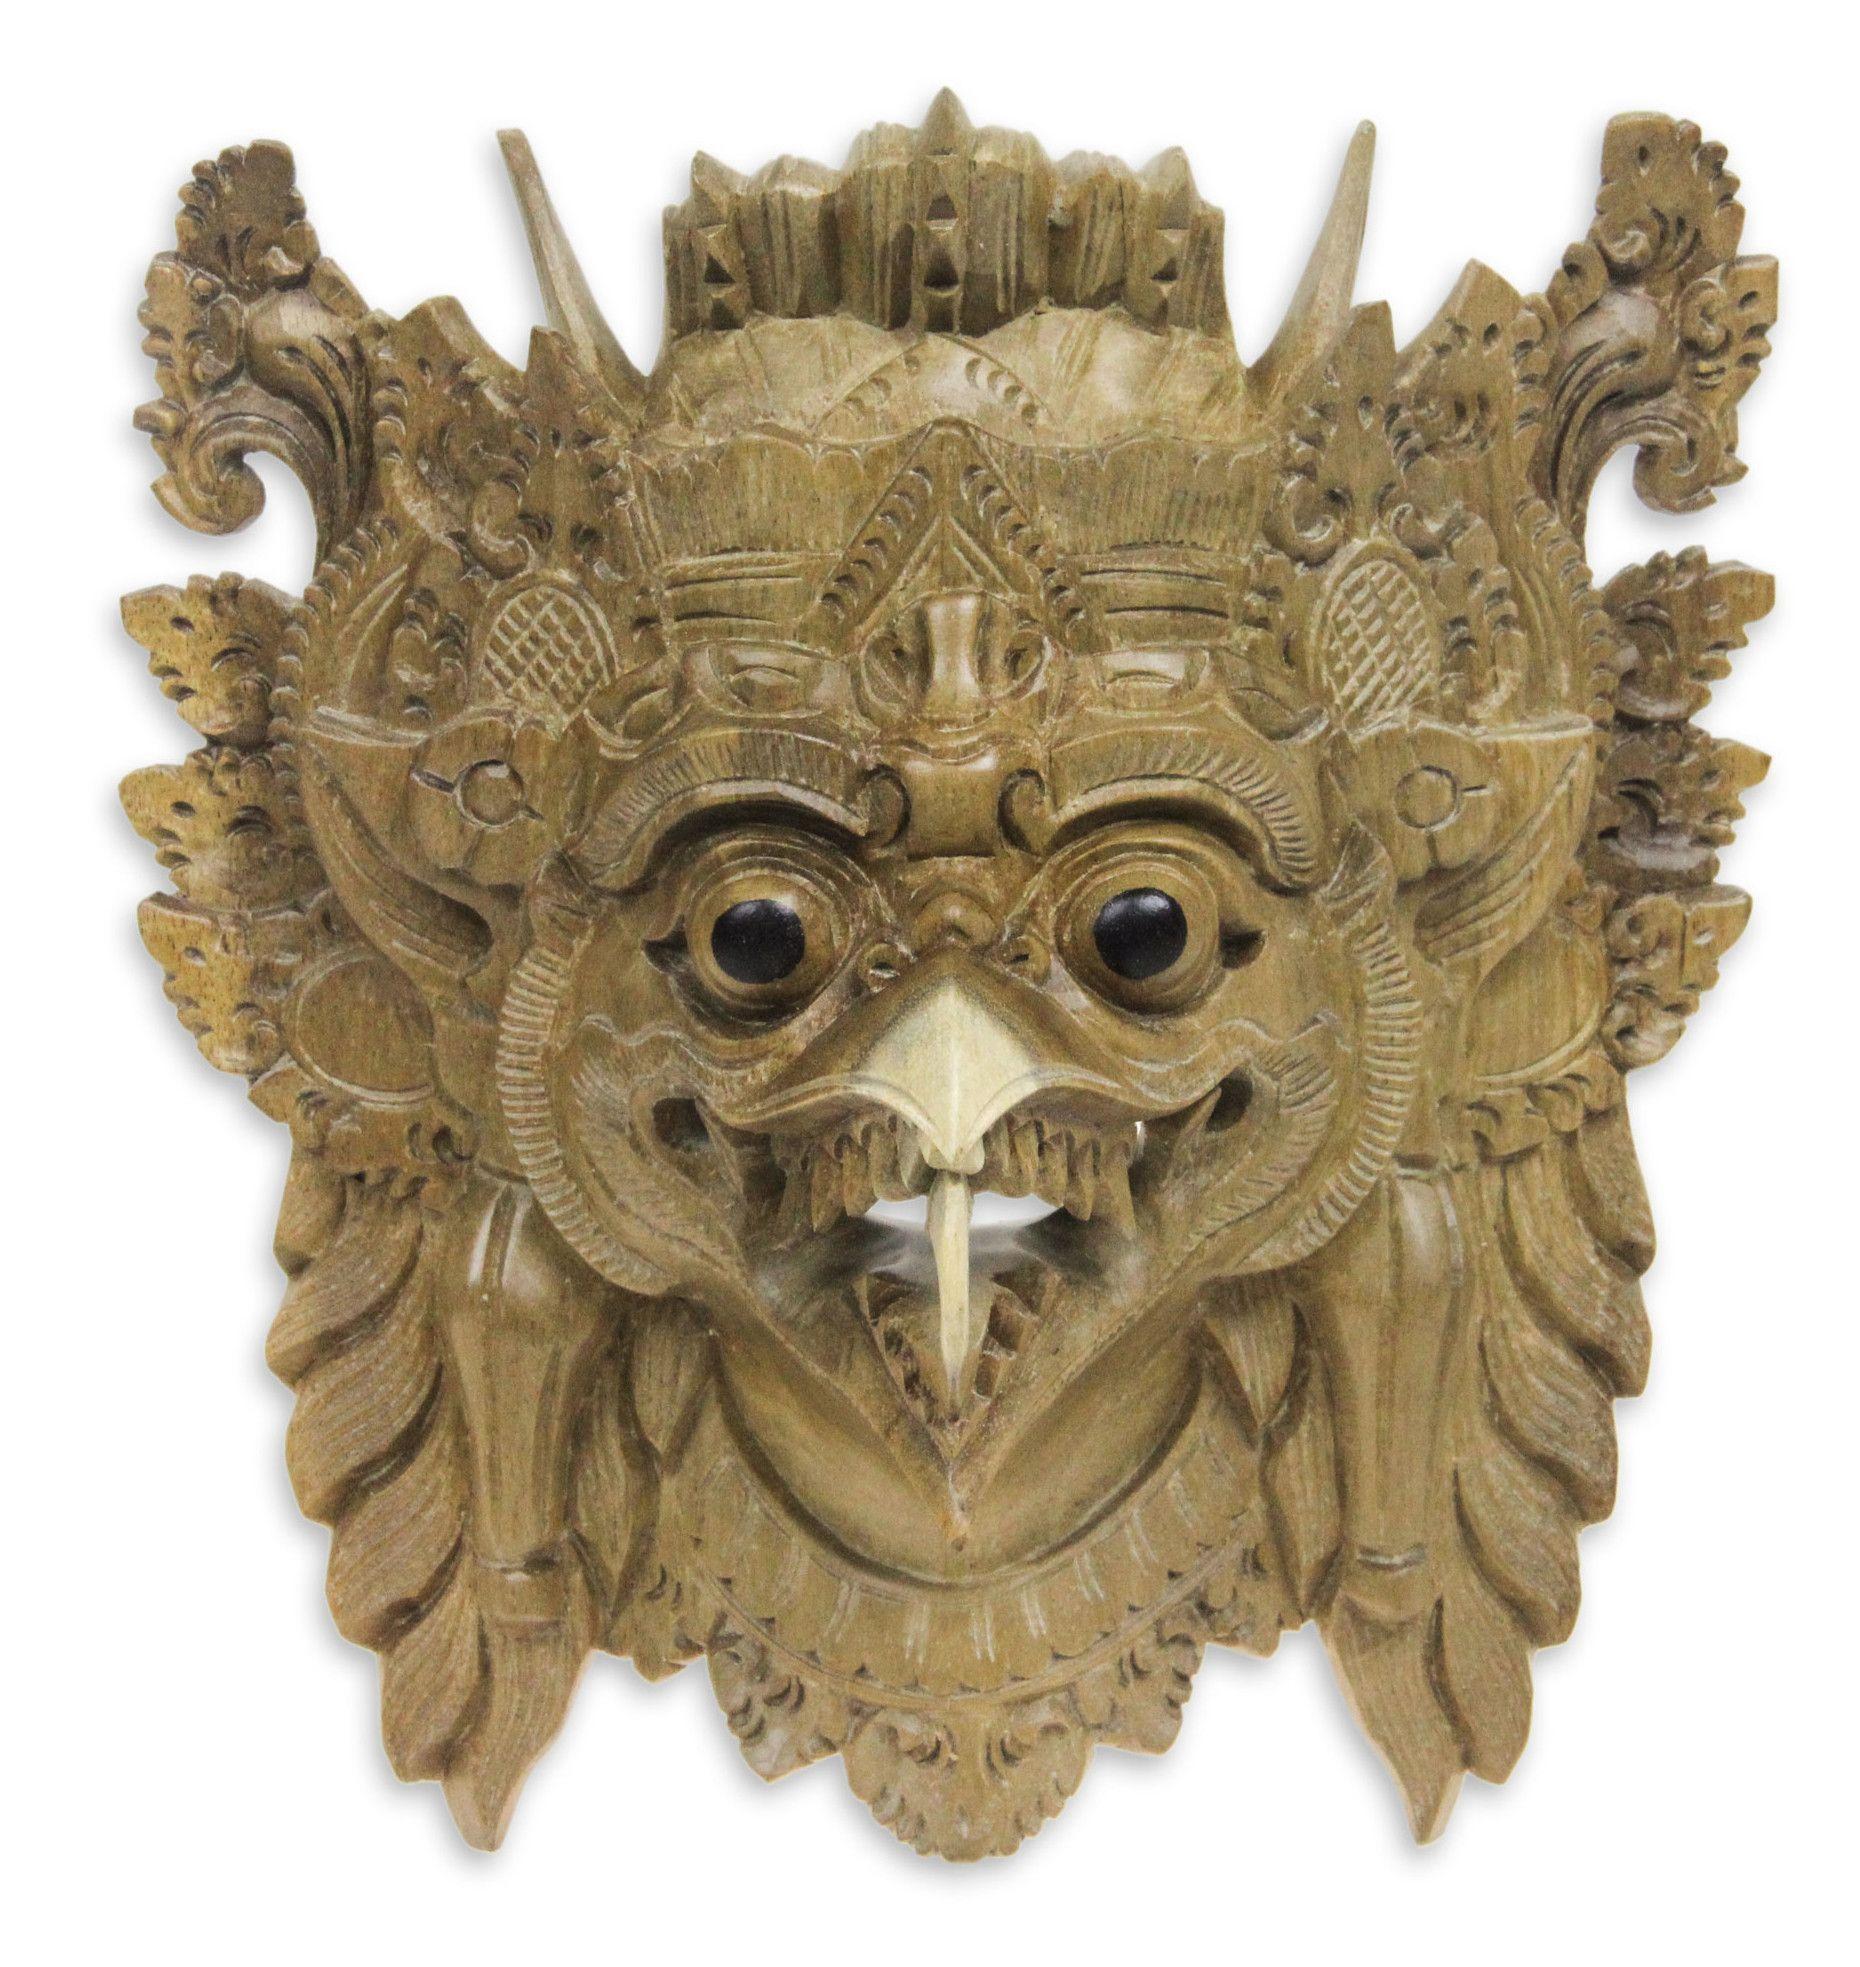 Made mulyani garuda the eagle balinese eagle mask wall decor